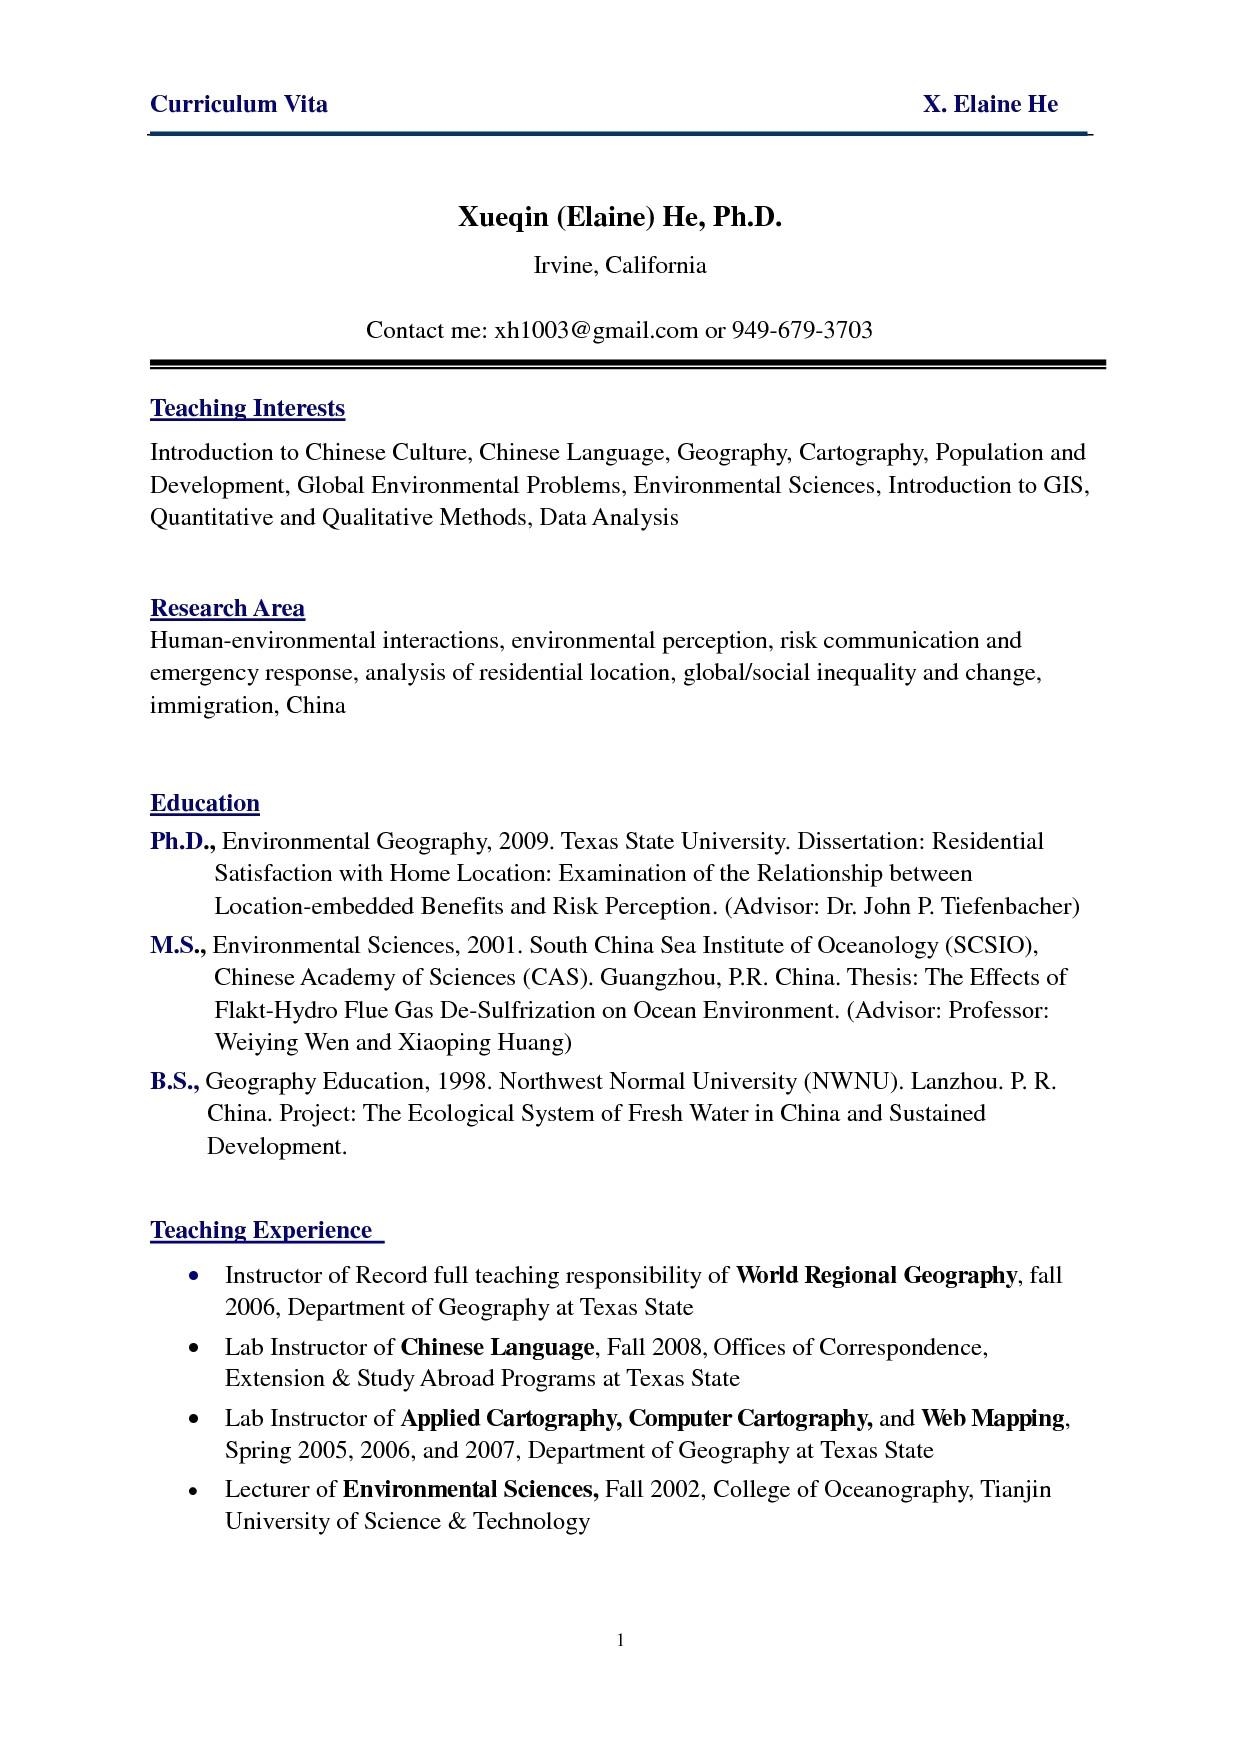 lpn resumes templates